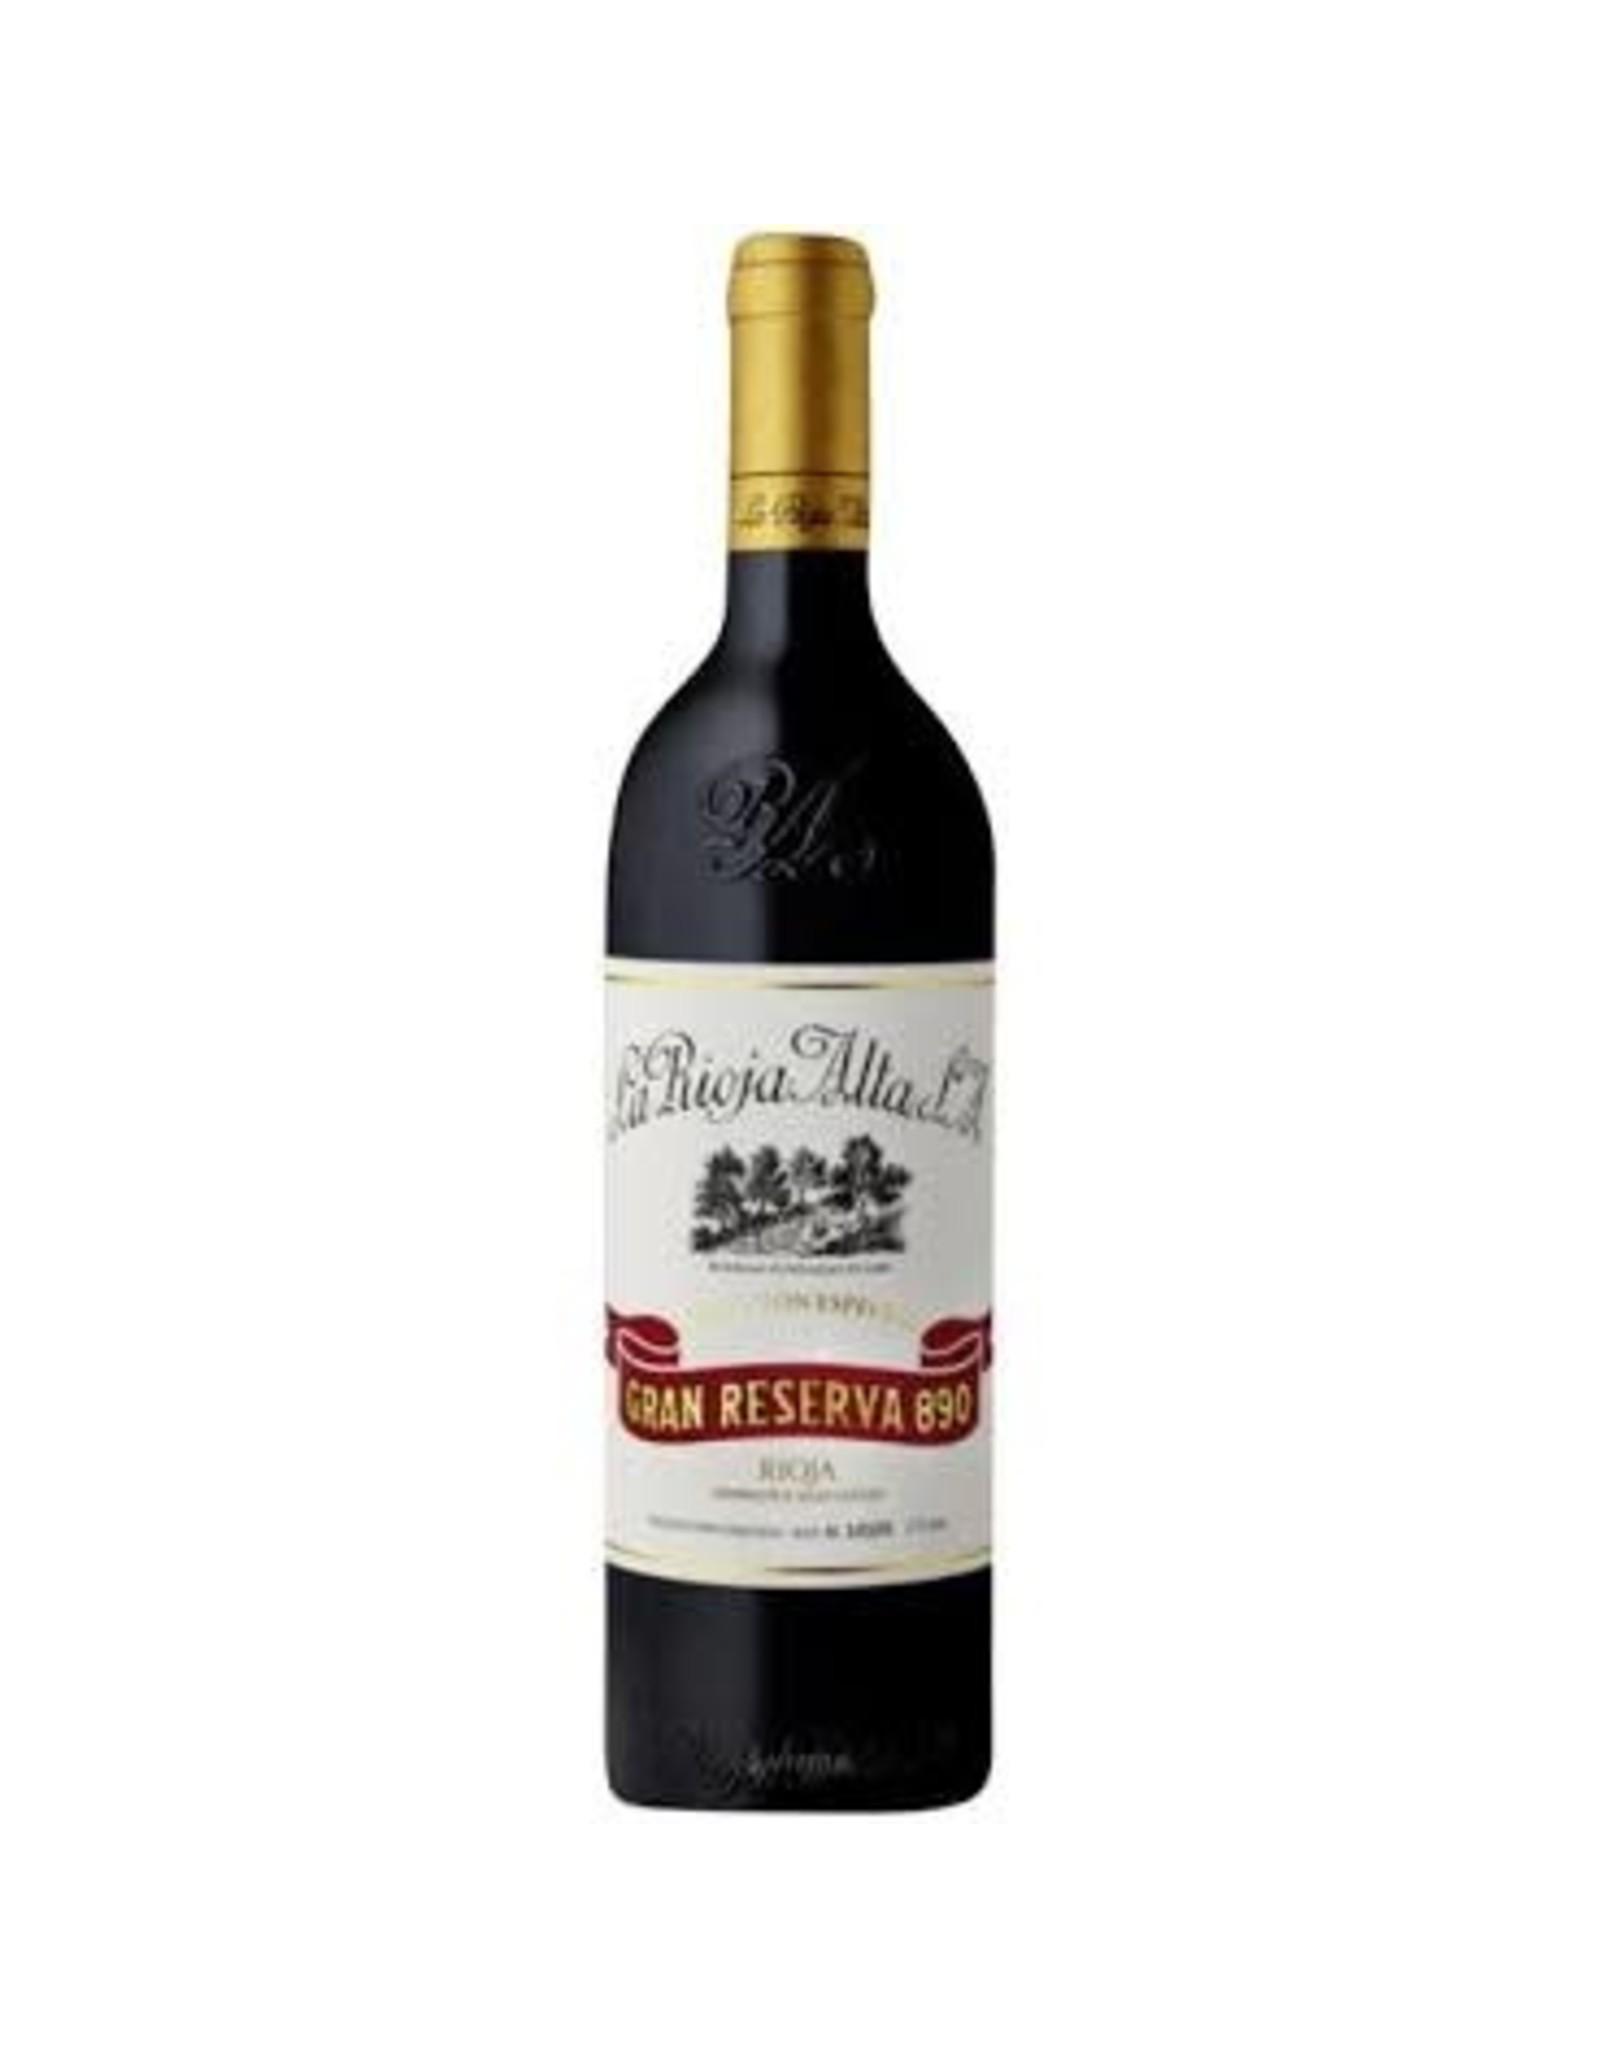 "La Rioja Alta Gran Reserva 890 ""Seleccion Especial"" 2005"